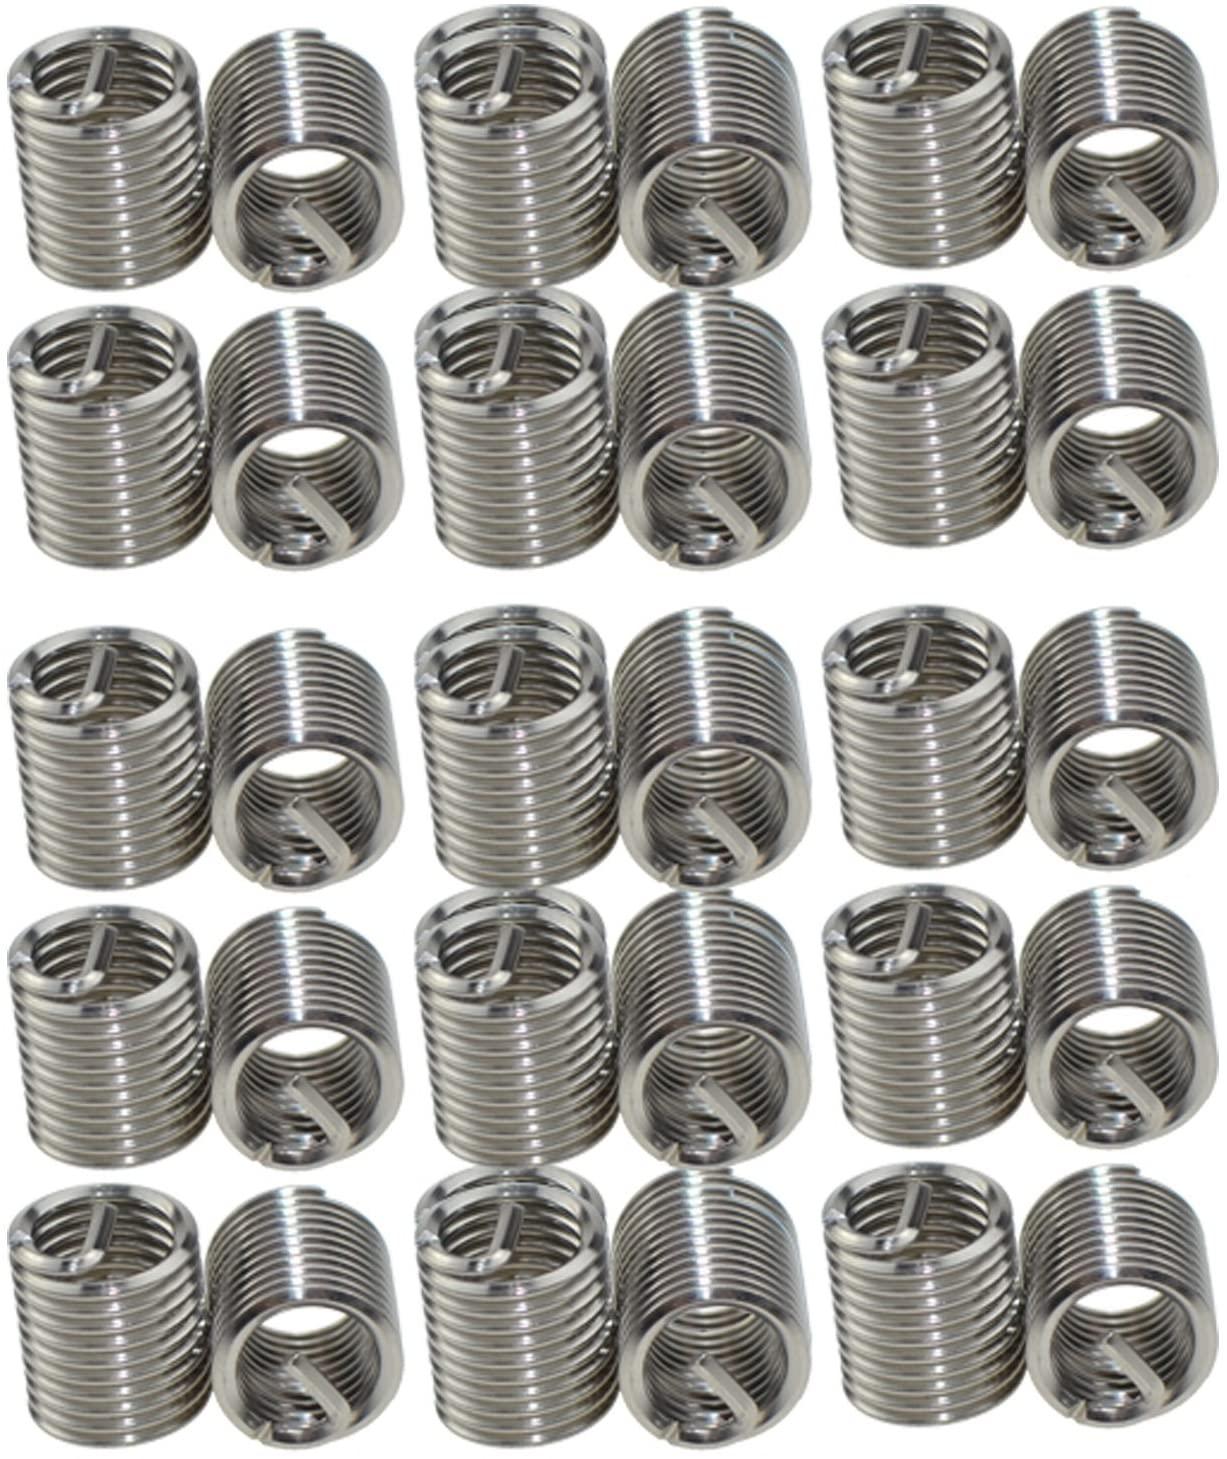 XunLiu 304 Stainless Steel Wire Thread Insert HeliCoil Stripped Thread Rethread Repair(30, M8-1.25X2.0D)